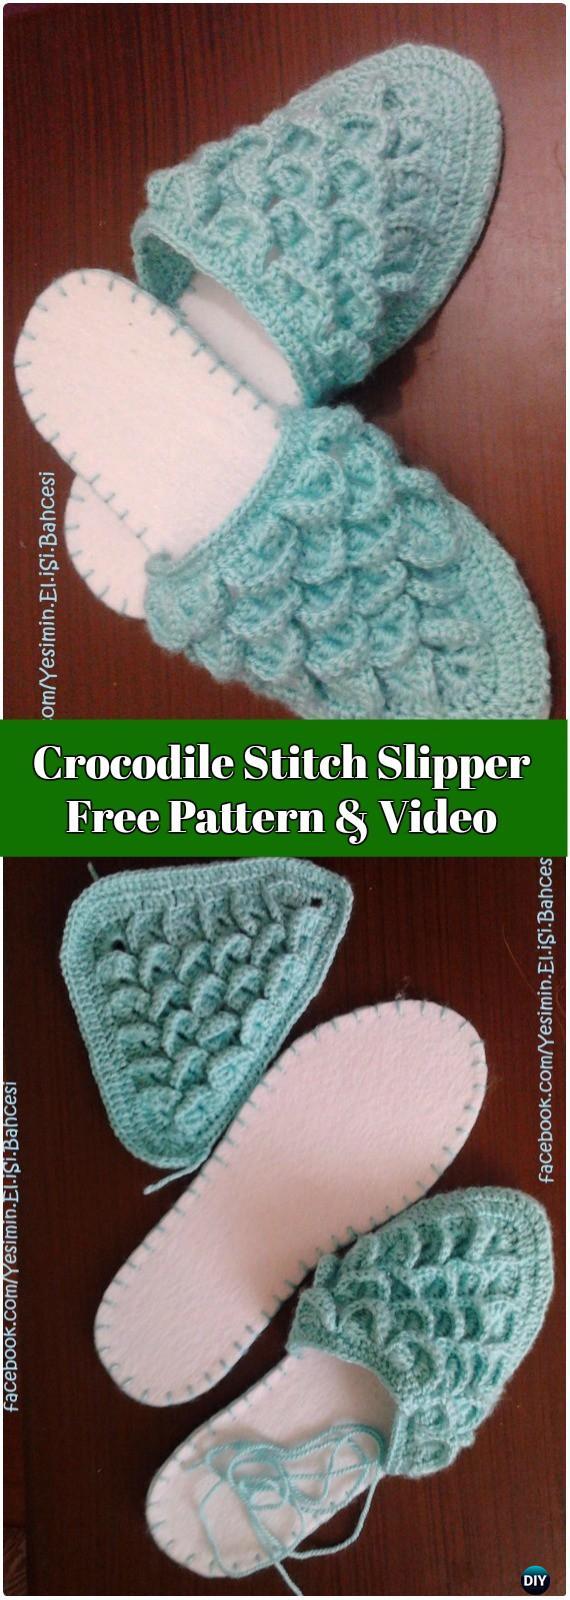 Crochet Crocodile Stitch Slippers Free Pattern Video - Crochet Women Slippers Free Patterns